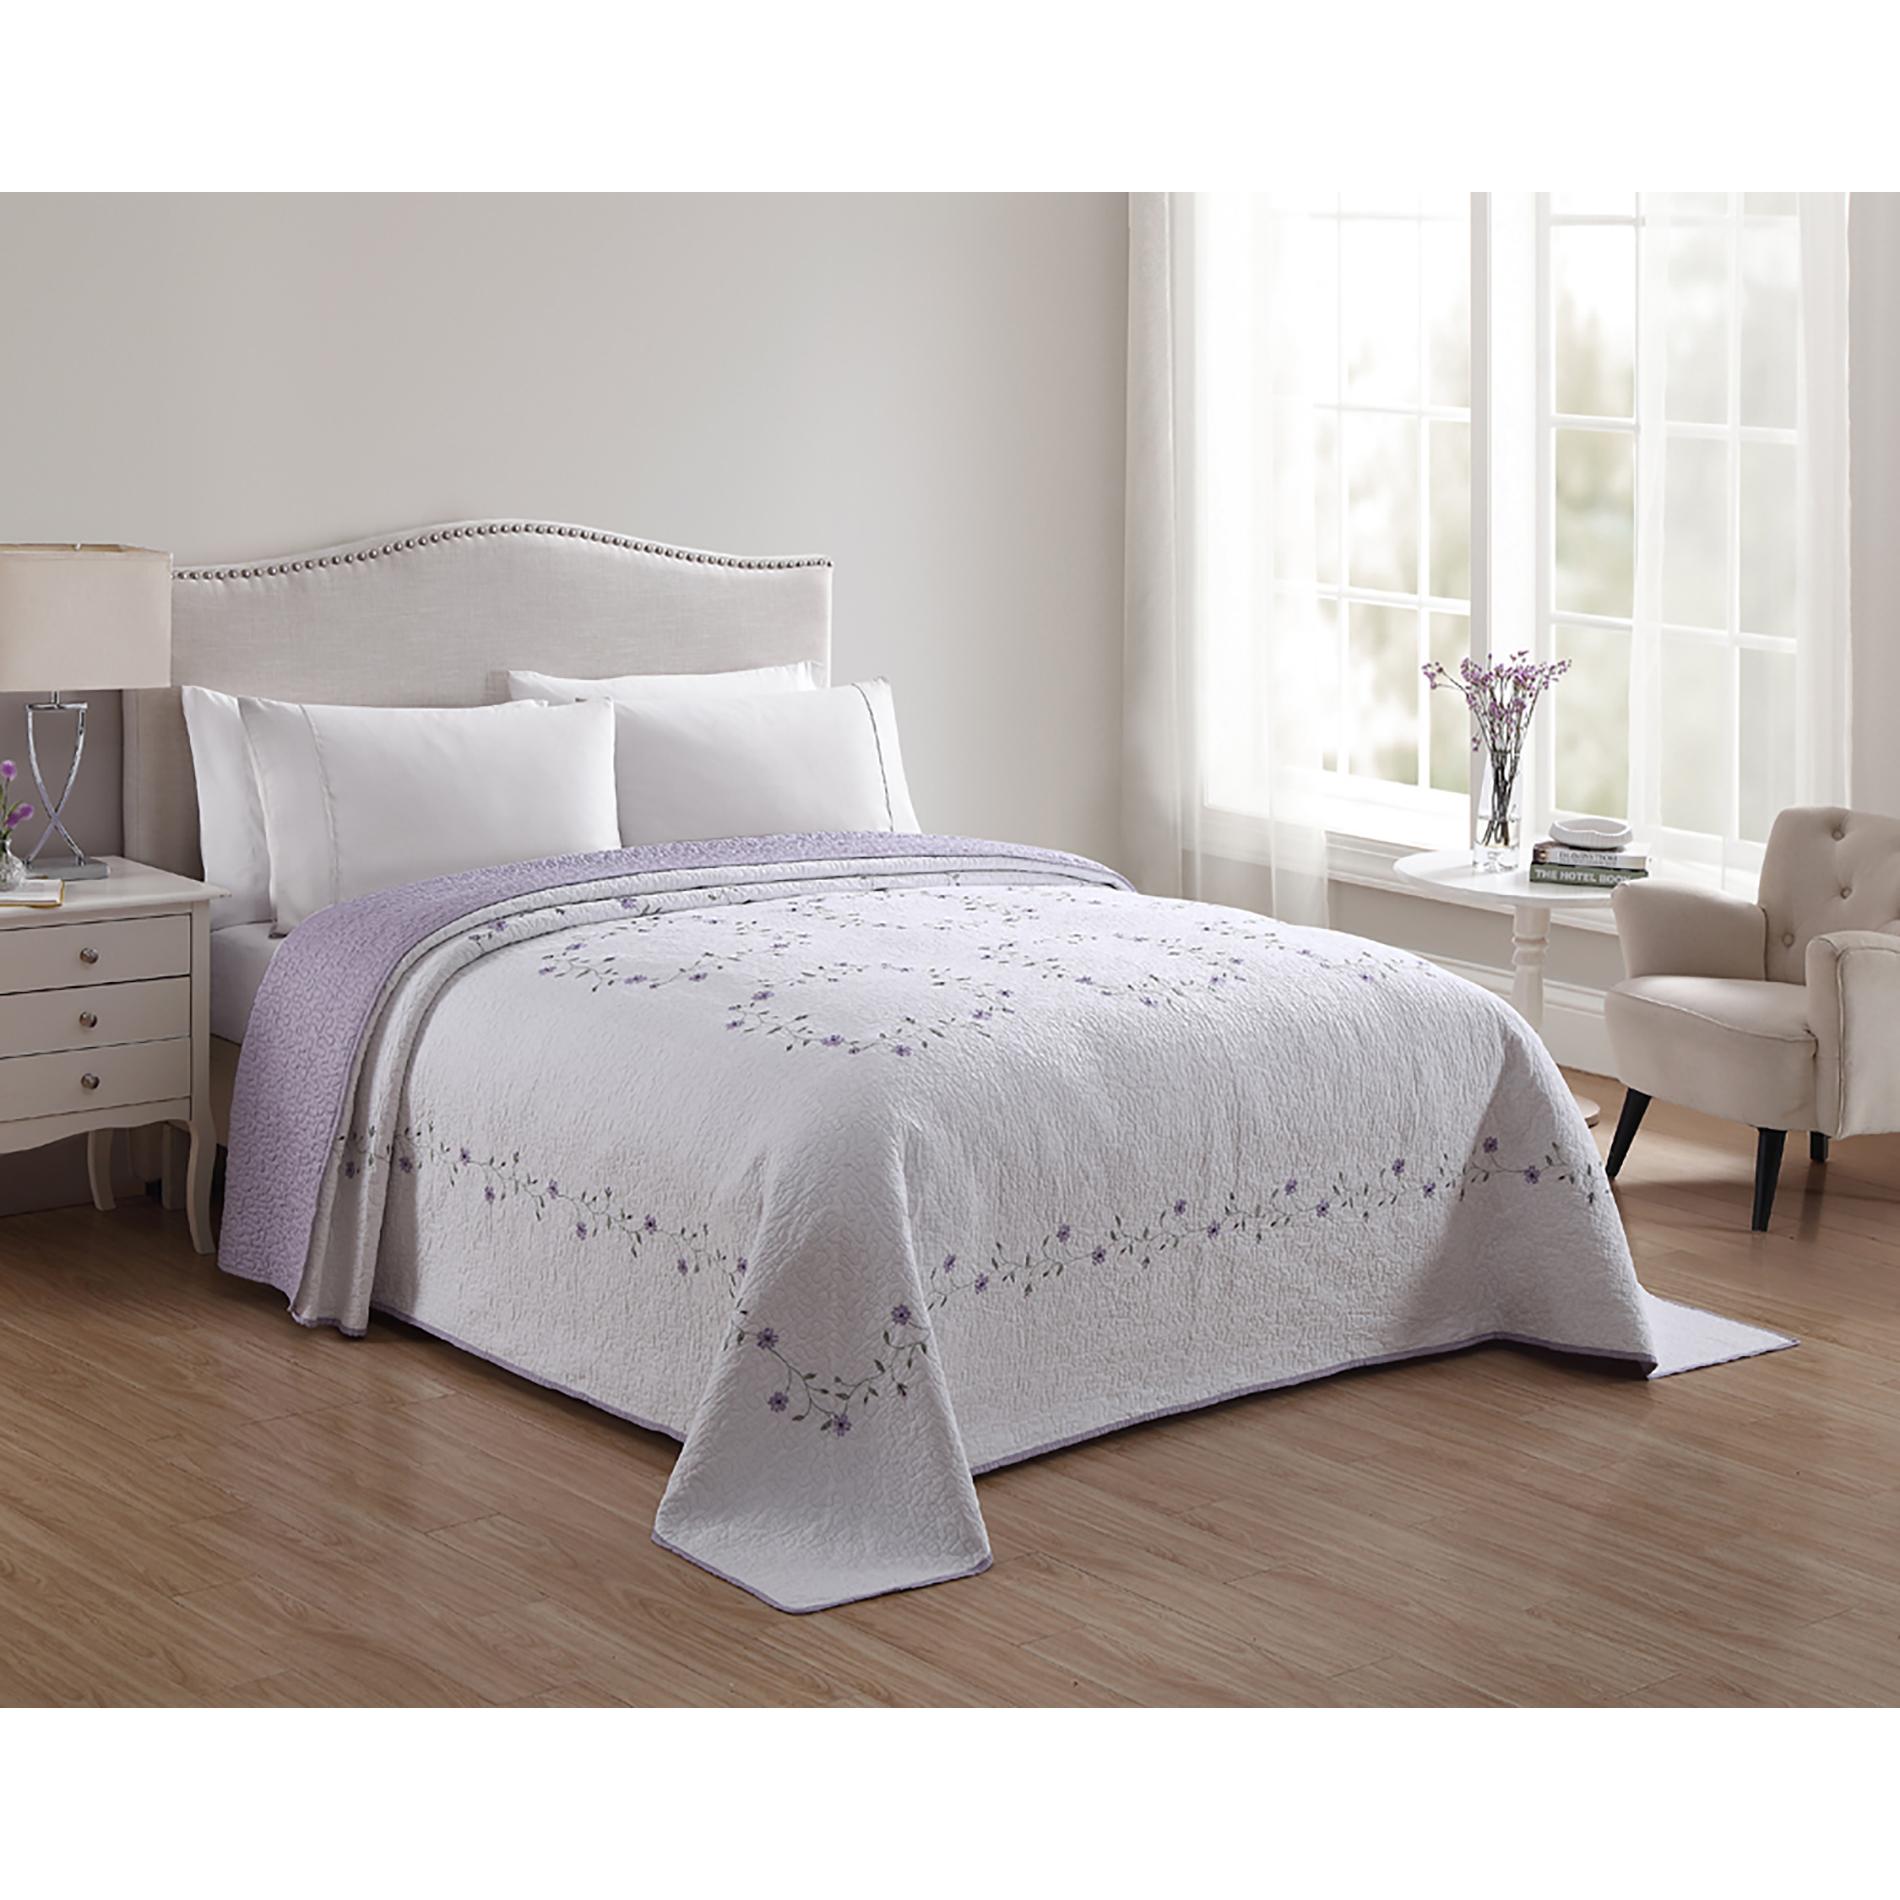 Cannon Floral Bedspread - Purple